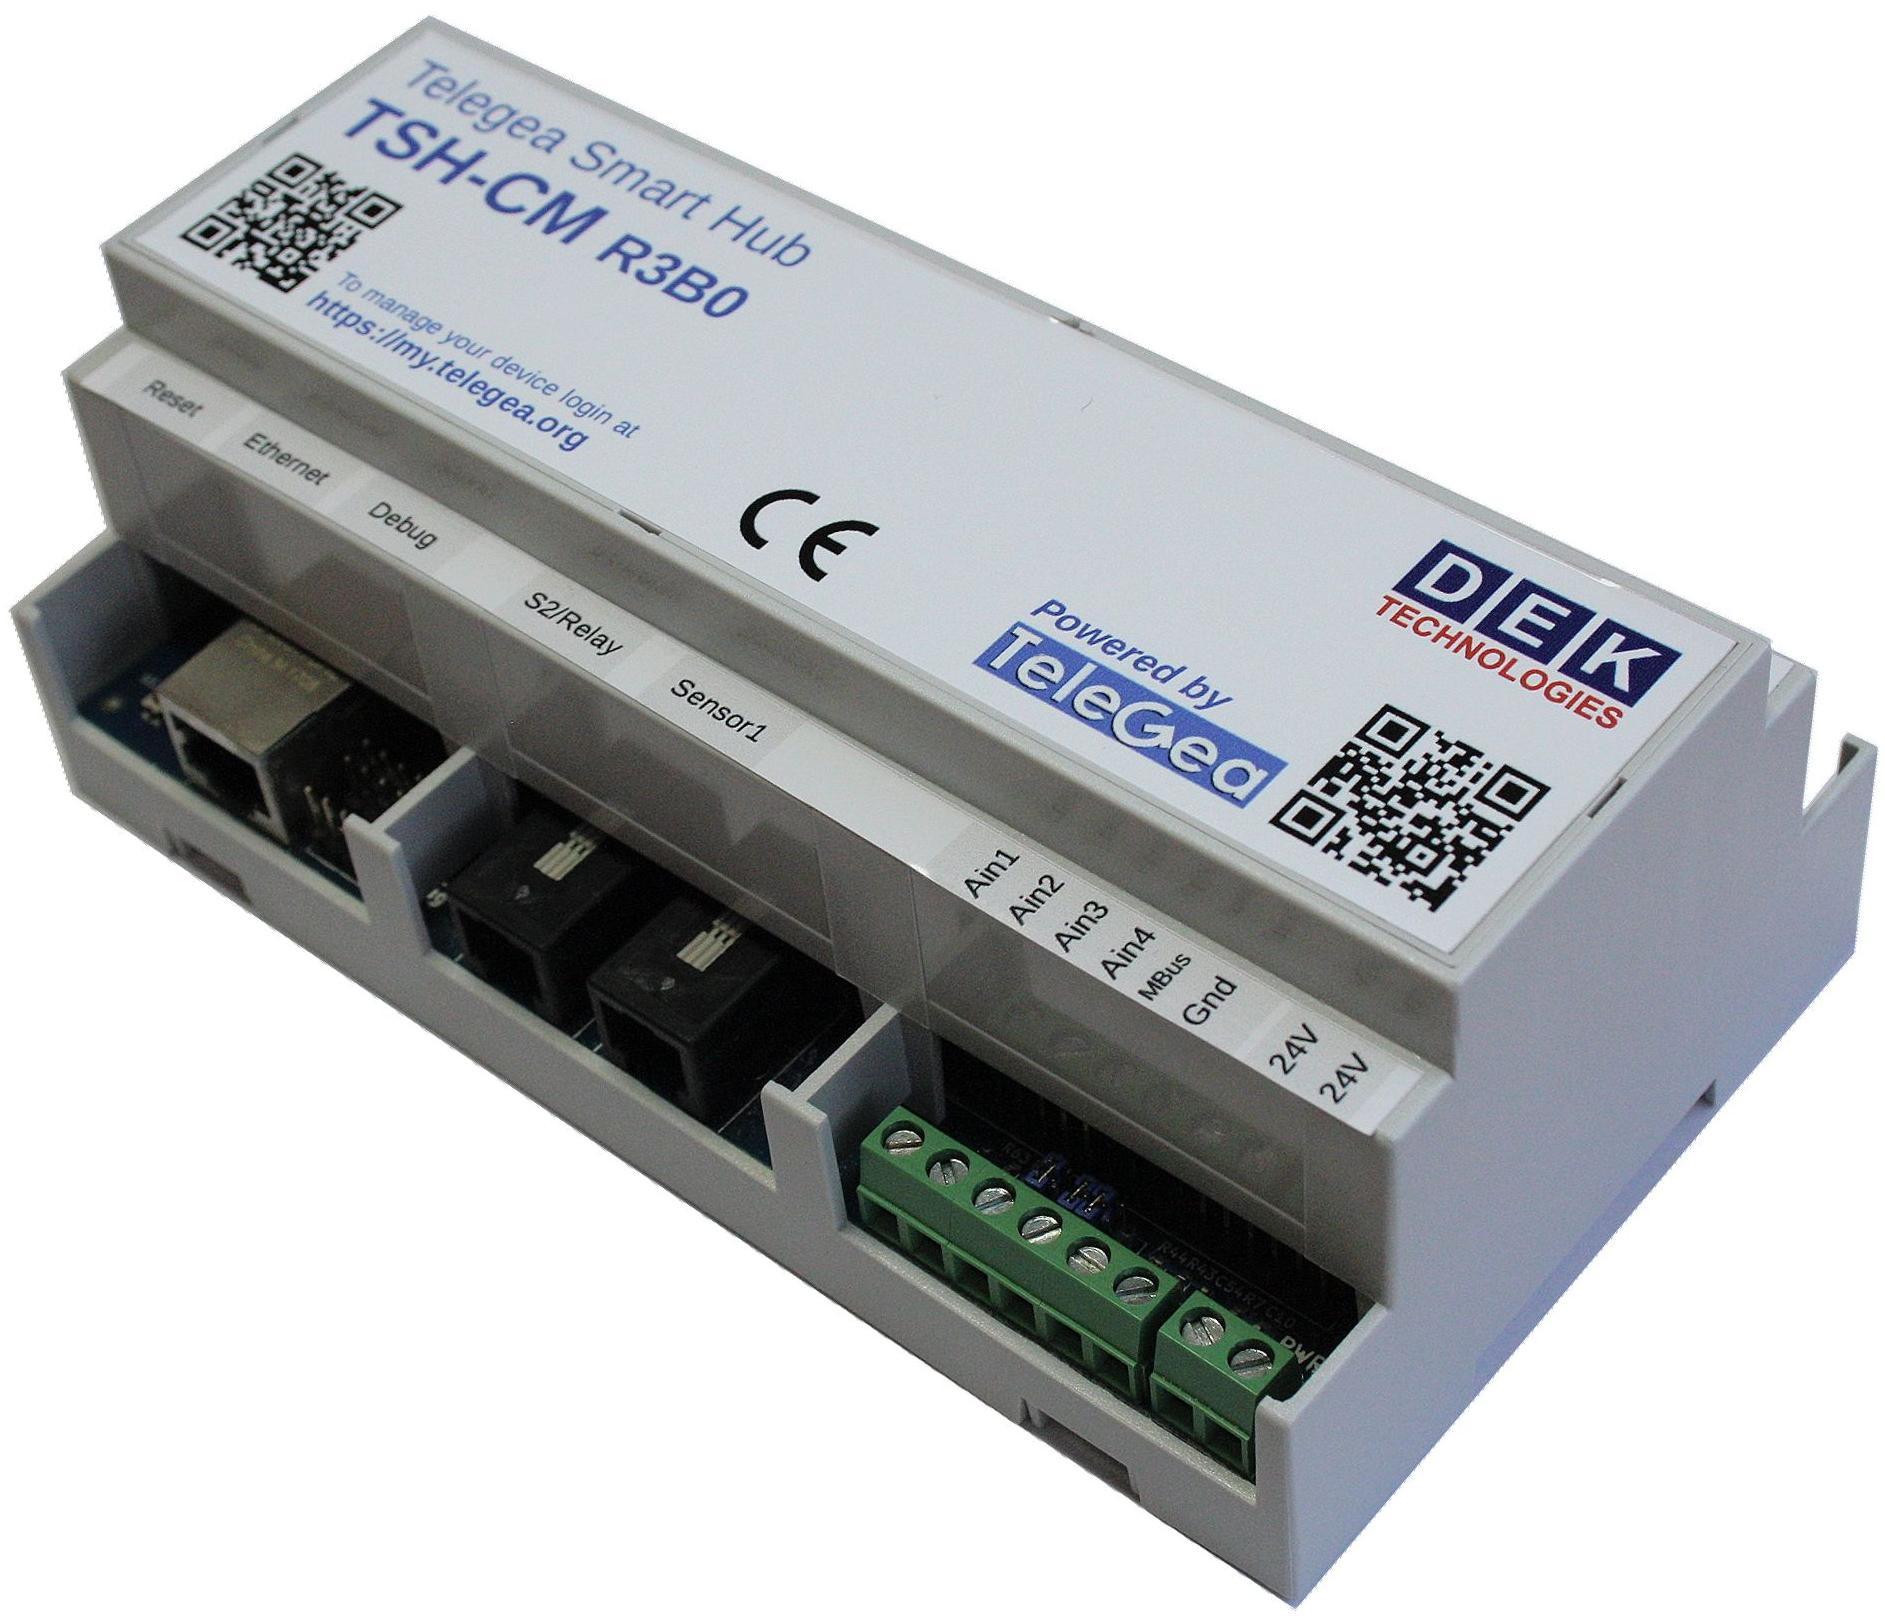 Telegea Smart Hub Din Rail Iot Gateway Is Powered By Raspberry Pi Cm3 Module